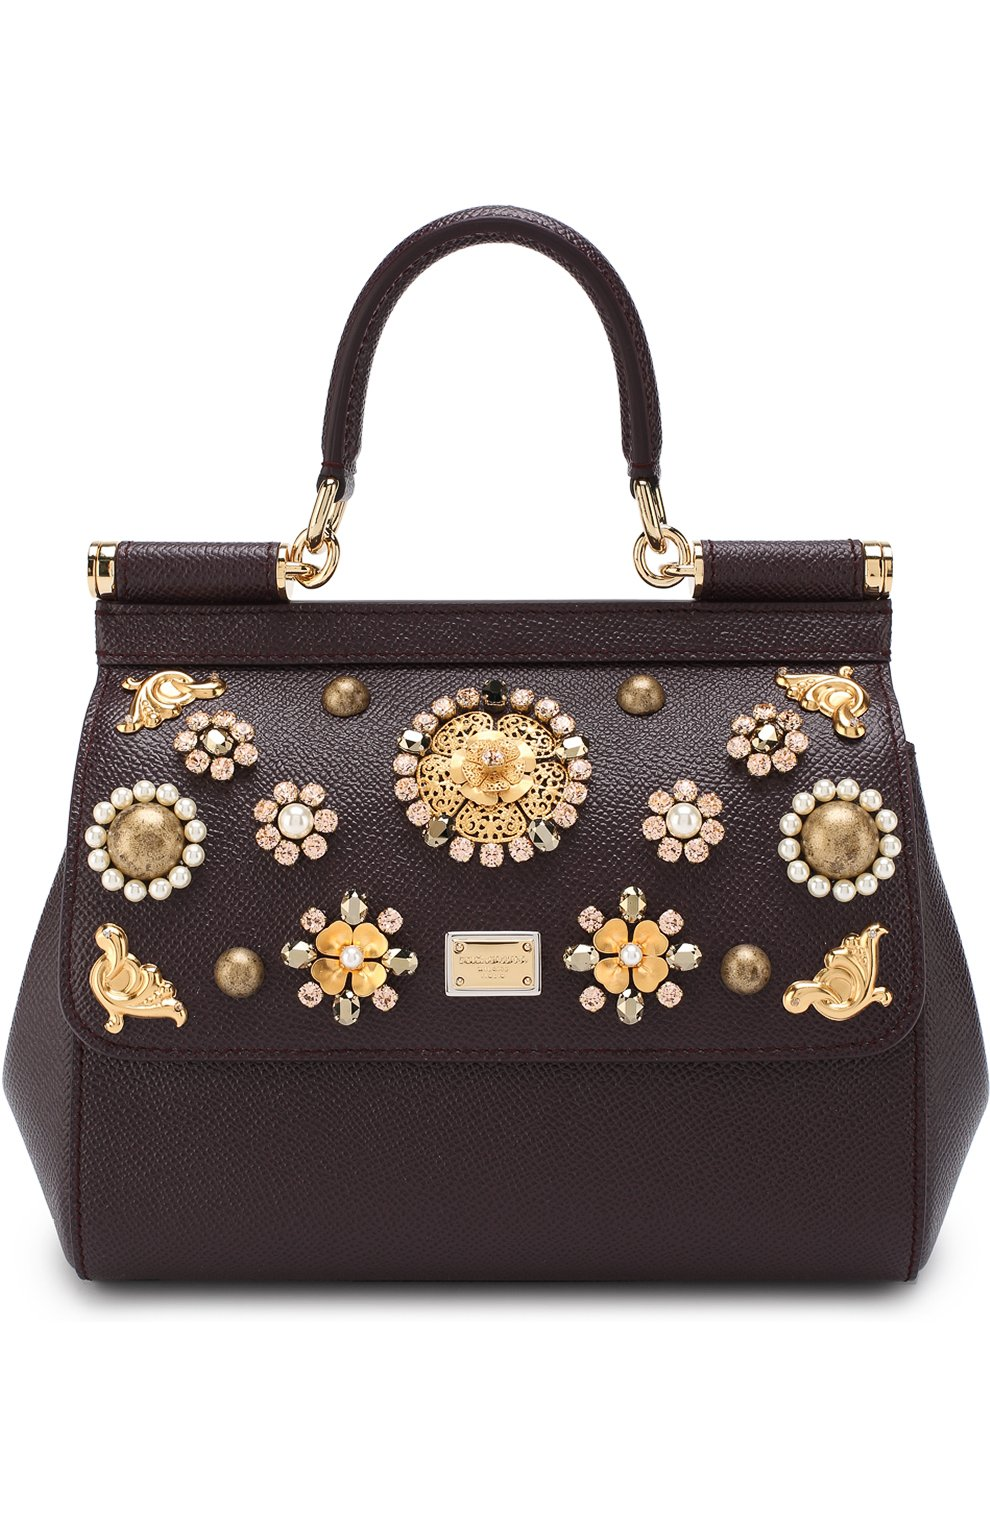 Женская сумка sicily small с аппликациями DOLCE & GABBANA бордового цвета, арт. BB6003/B5230 | Фото 1